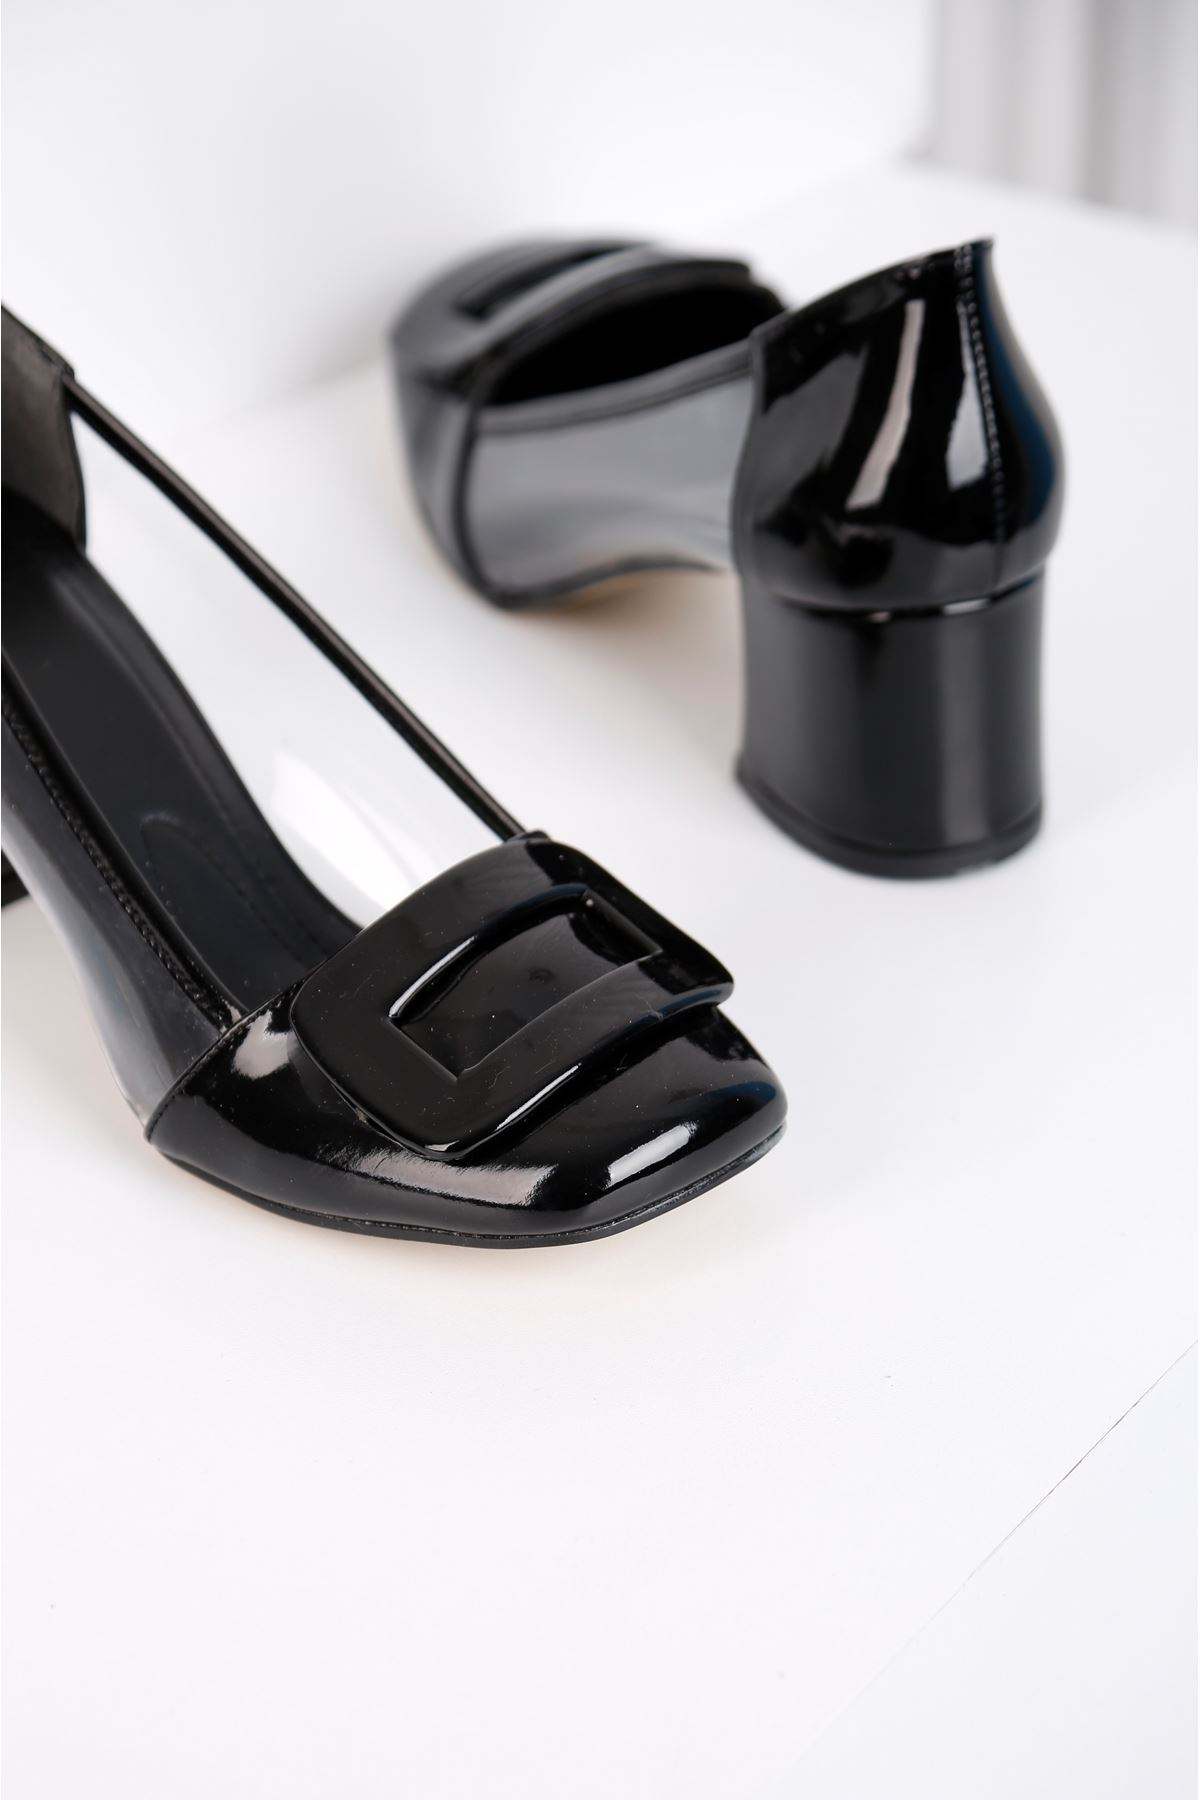 Barbie Topuklu Siyah Şefaf Ayakkabı